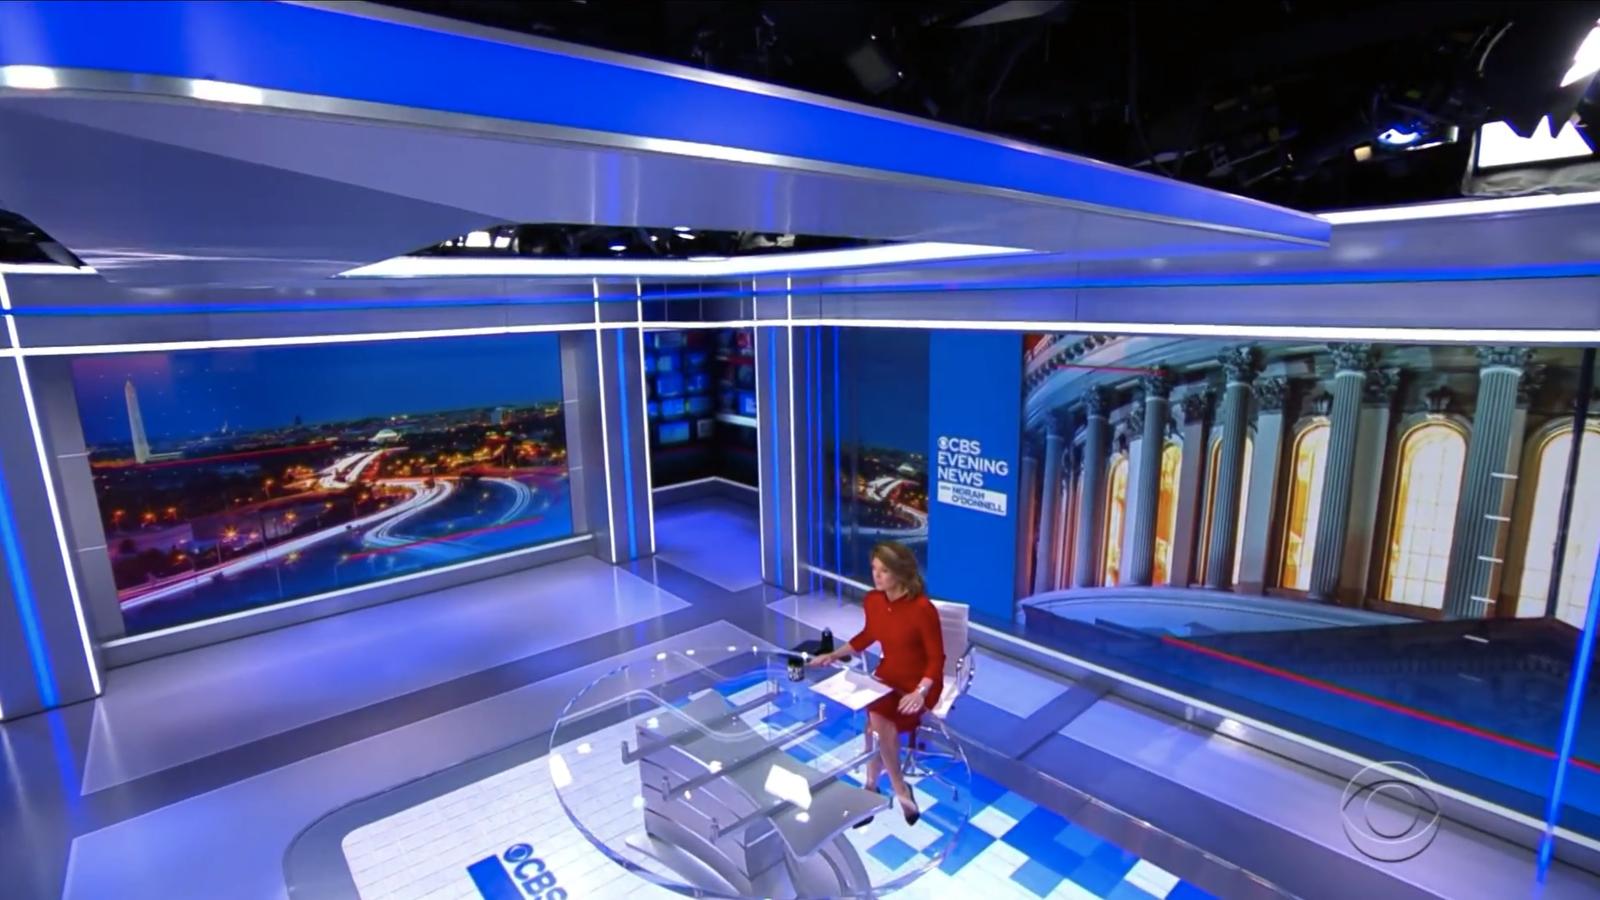 NCS_CBS-News-Washington-Bureau_STUDIO-2019_0003